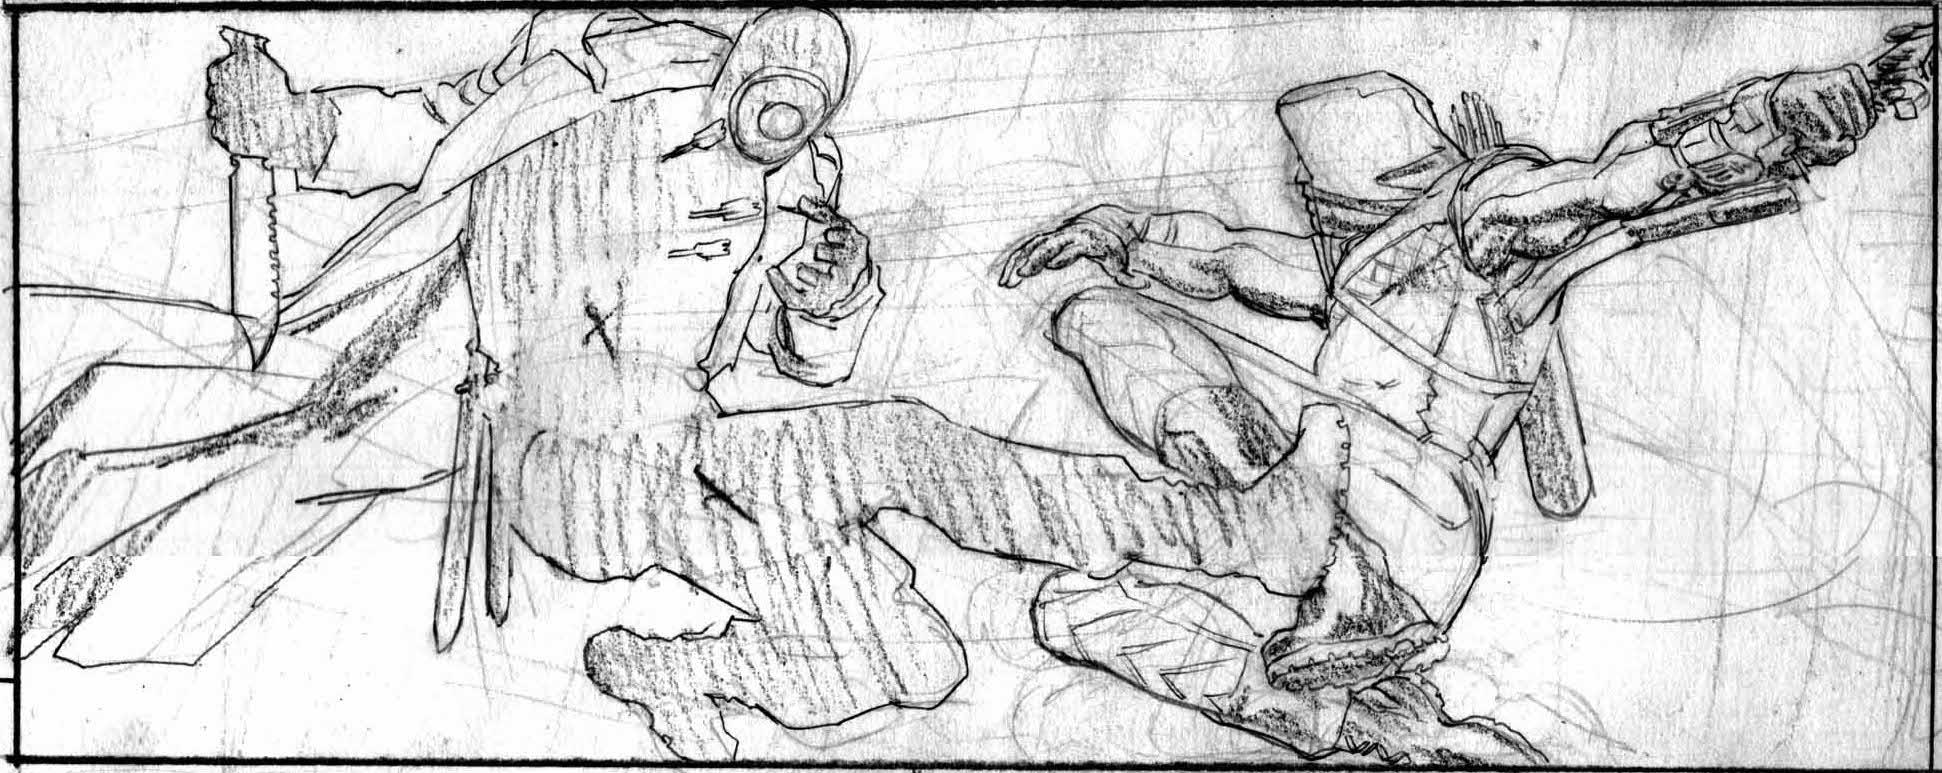 Arrow Season 2.5 - Chapter 24 - pg. 5 (Pencils).jpg